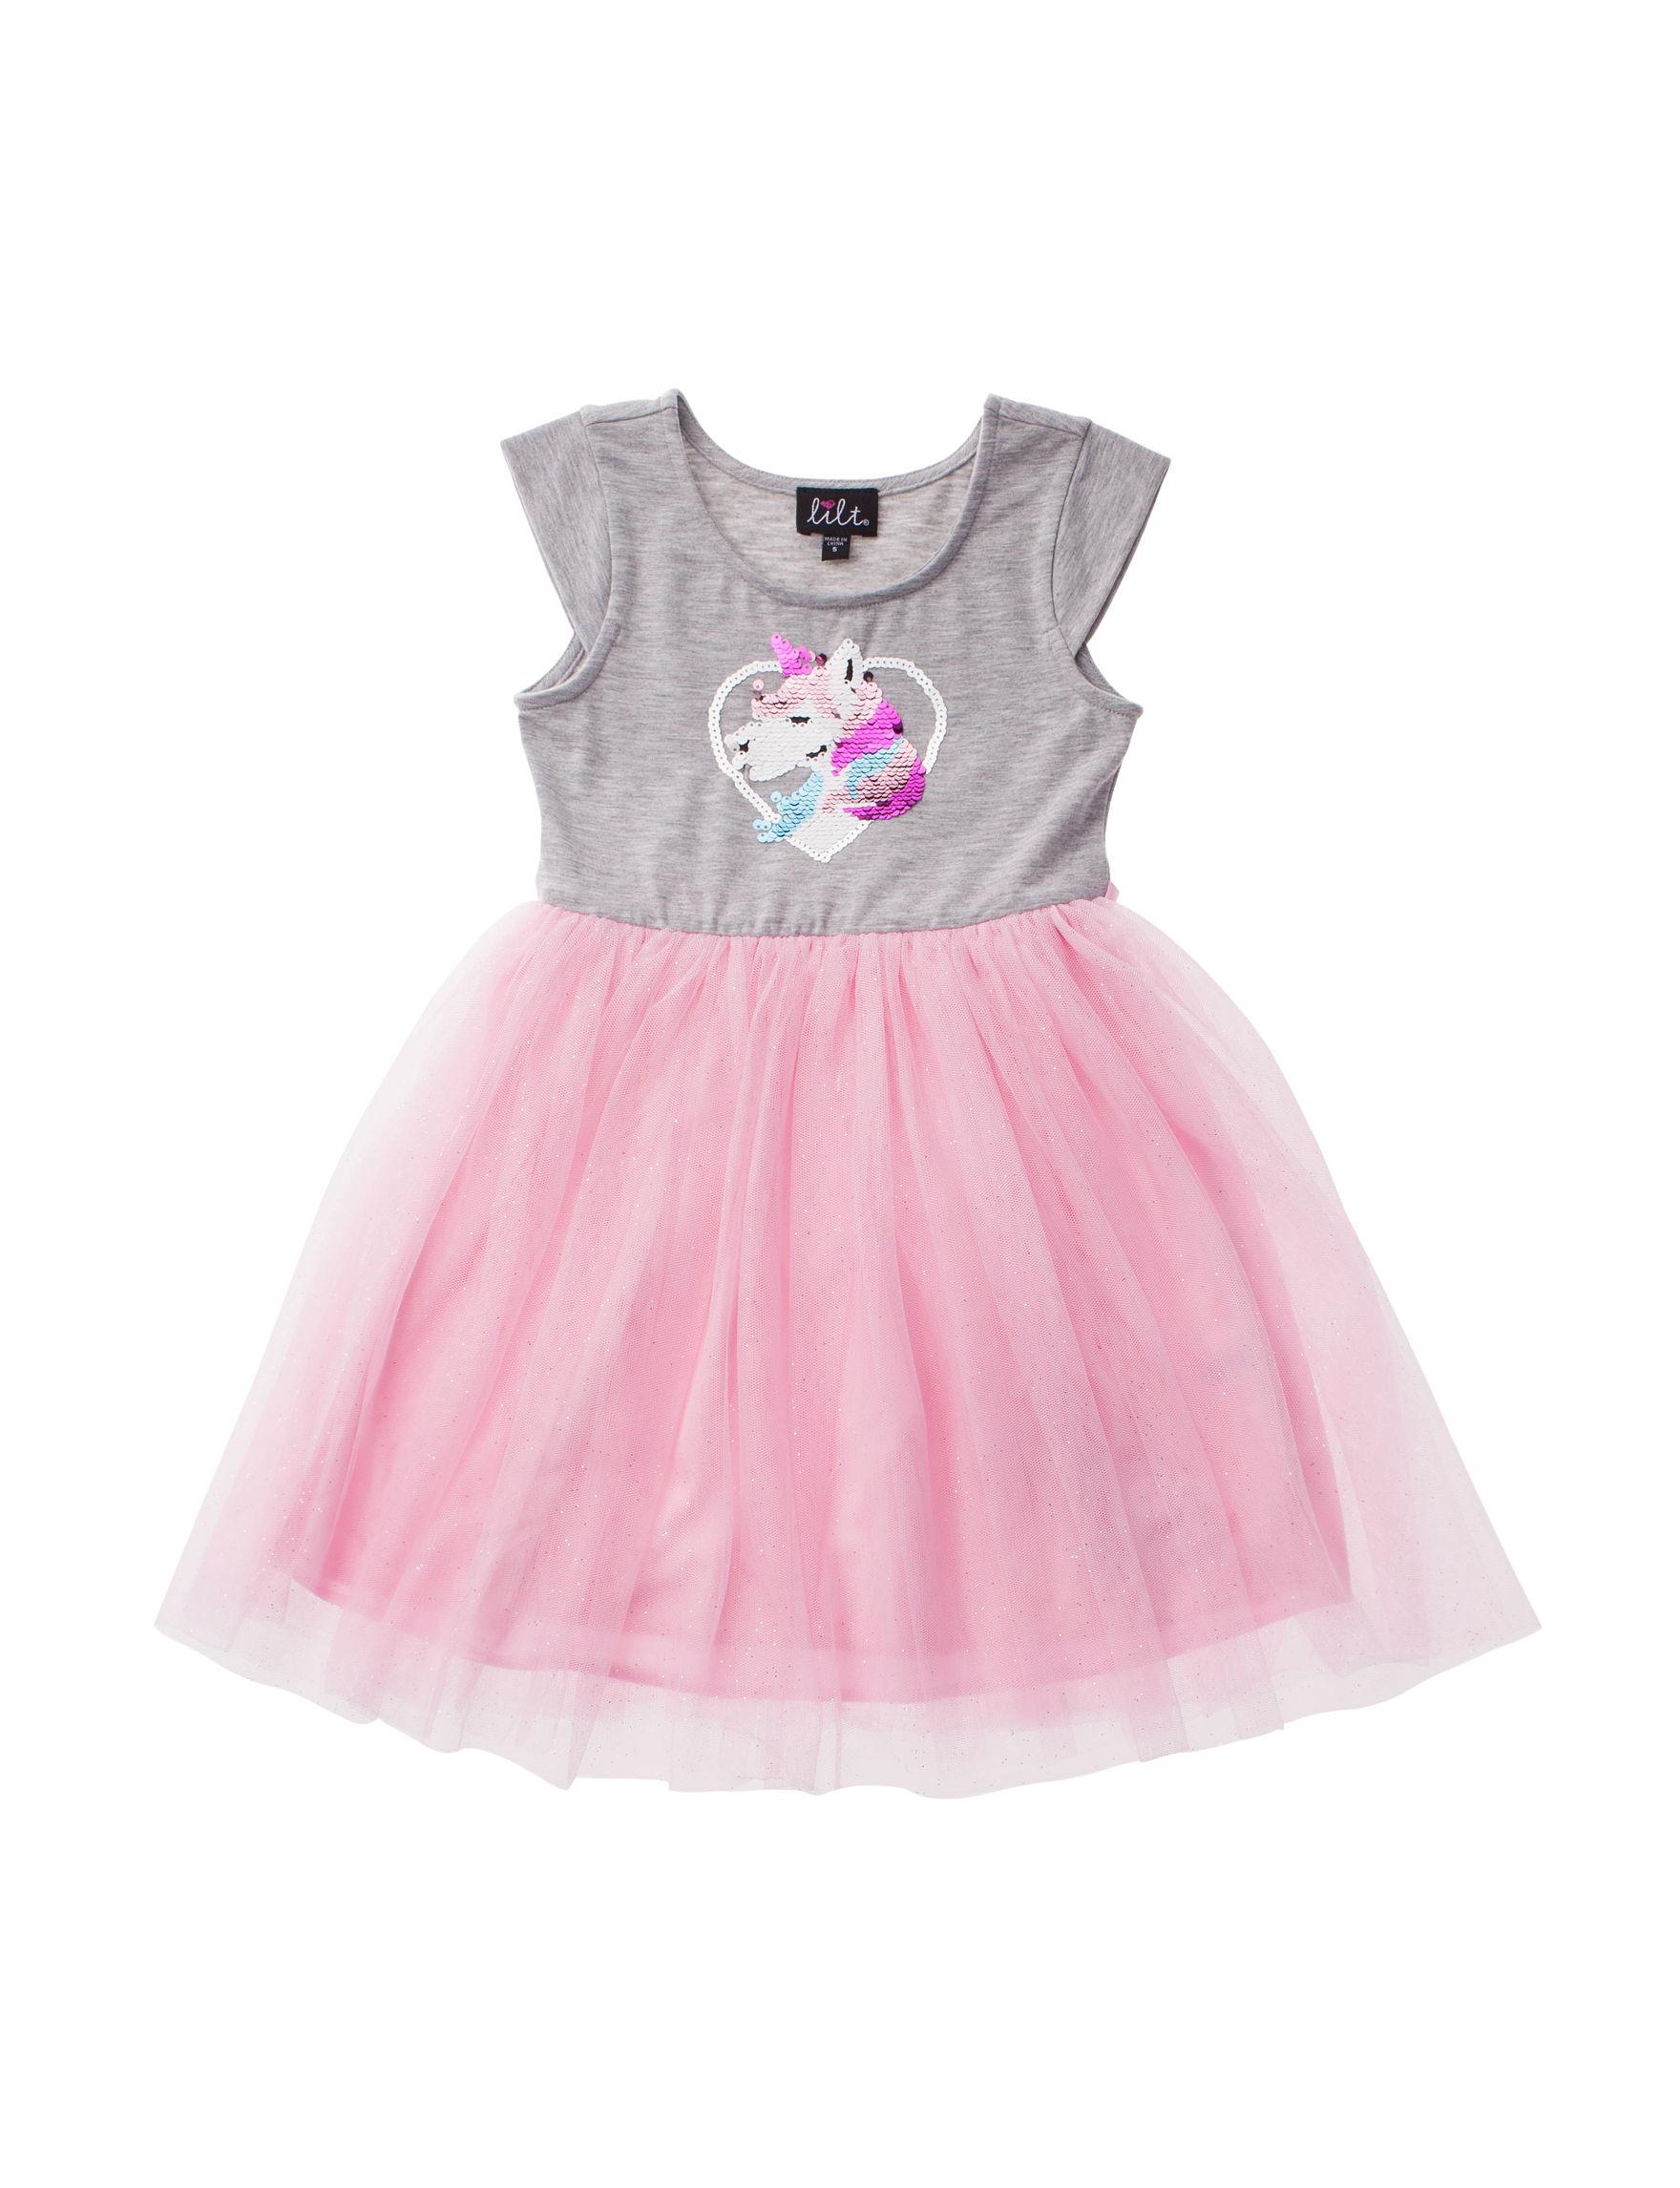 Lilt Grey / Pink Multi